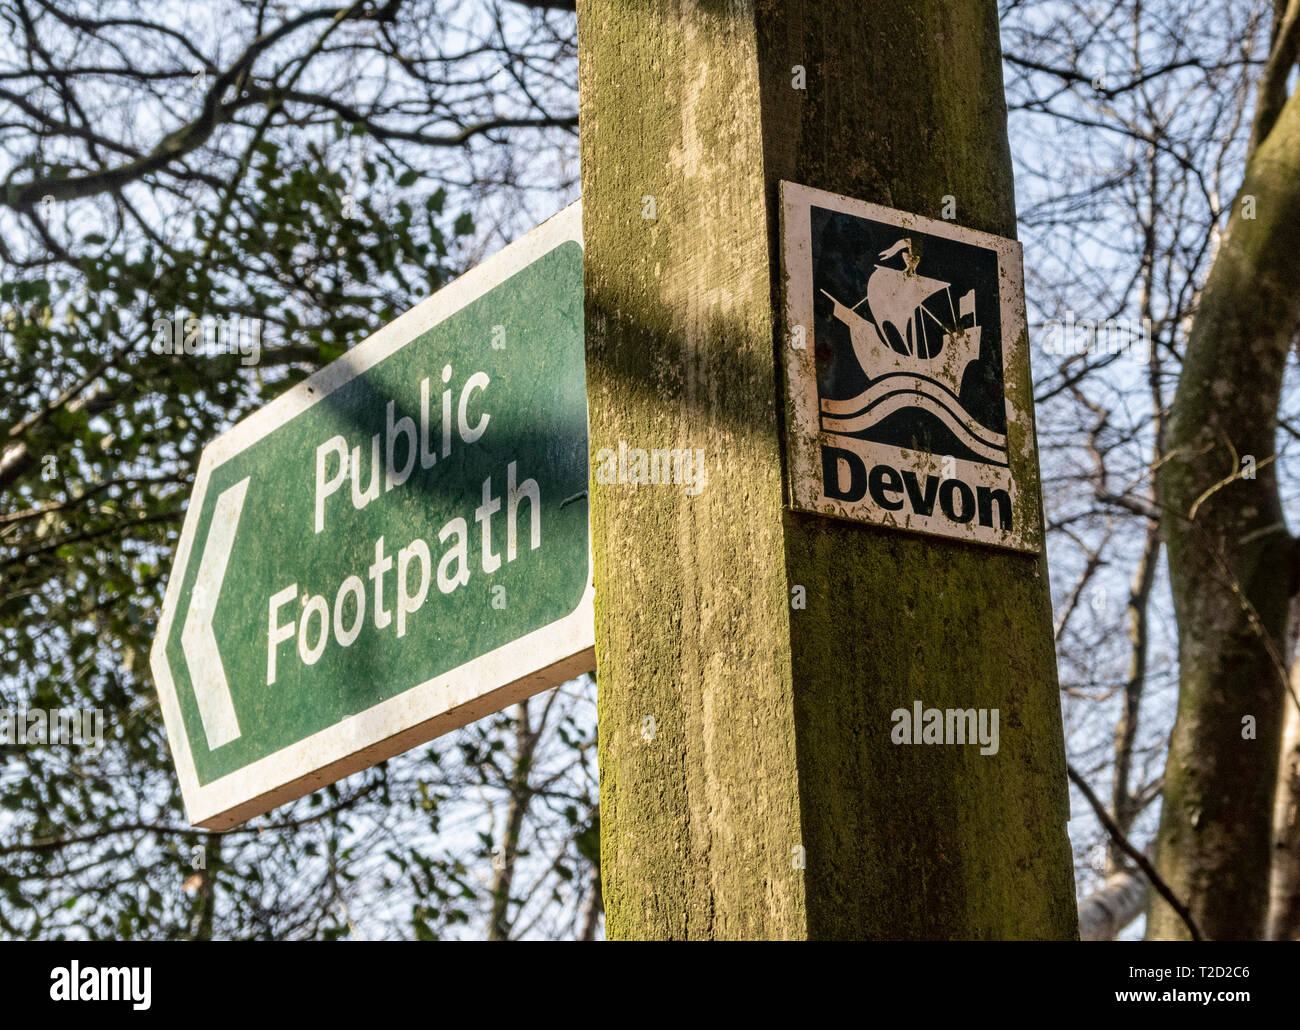 Public footpath with Devon sign. Stock Photo